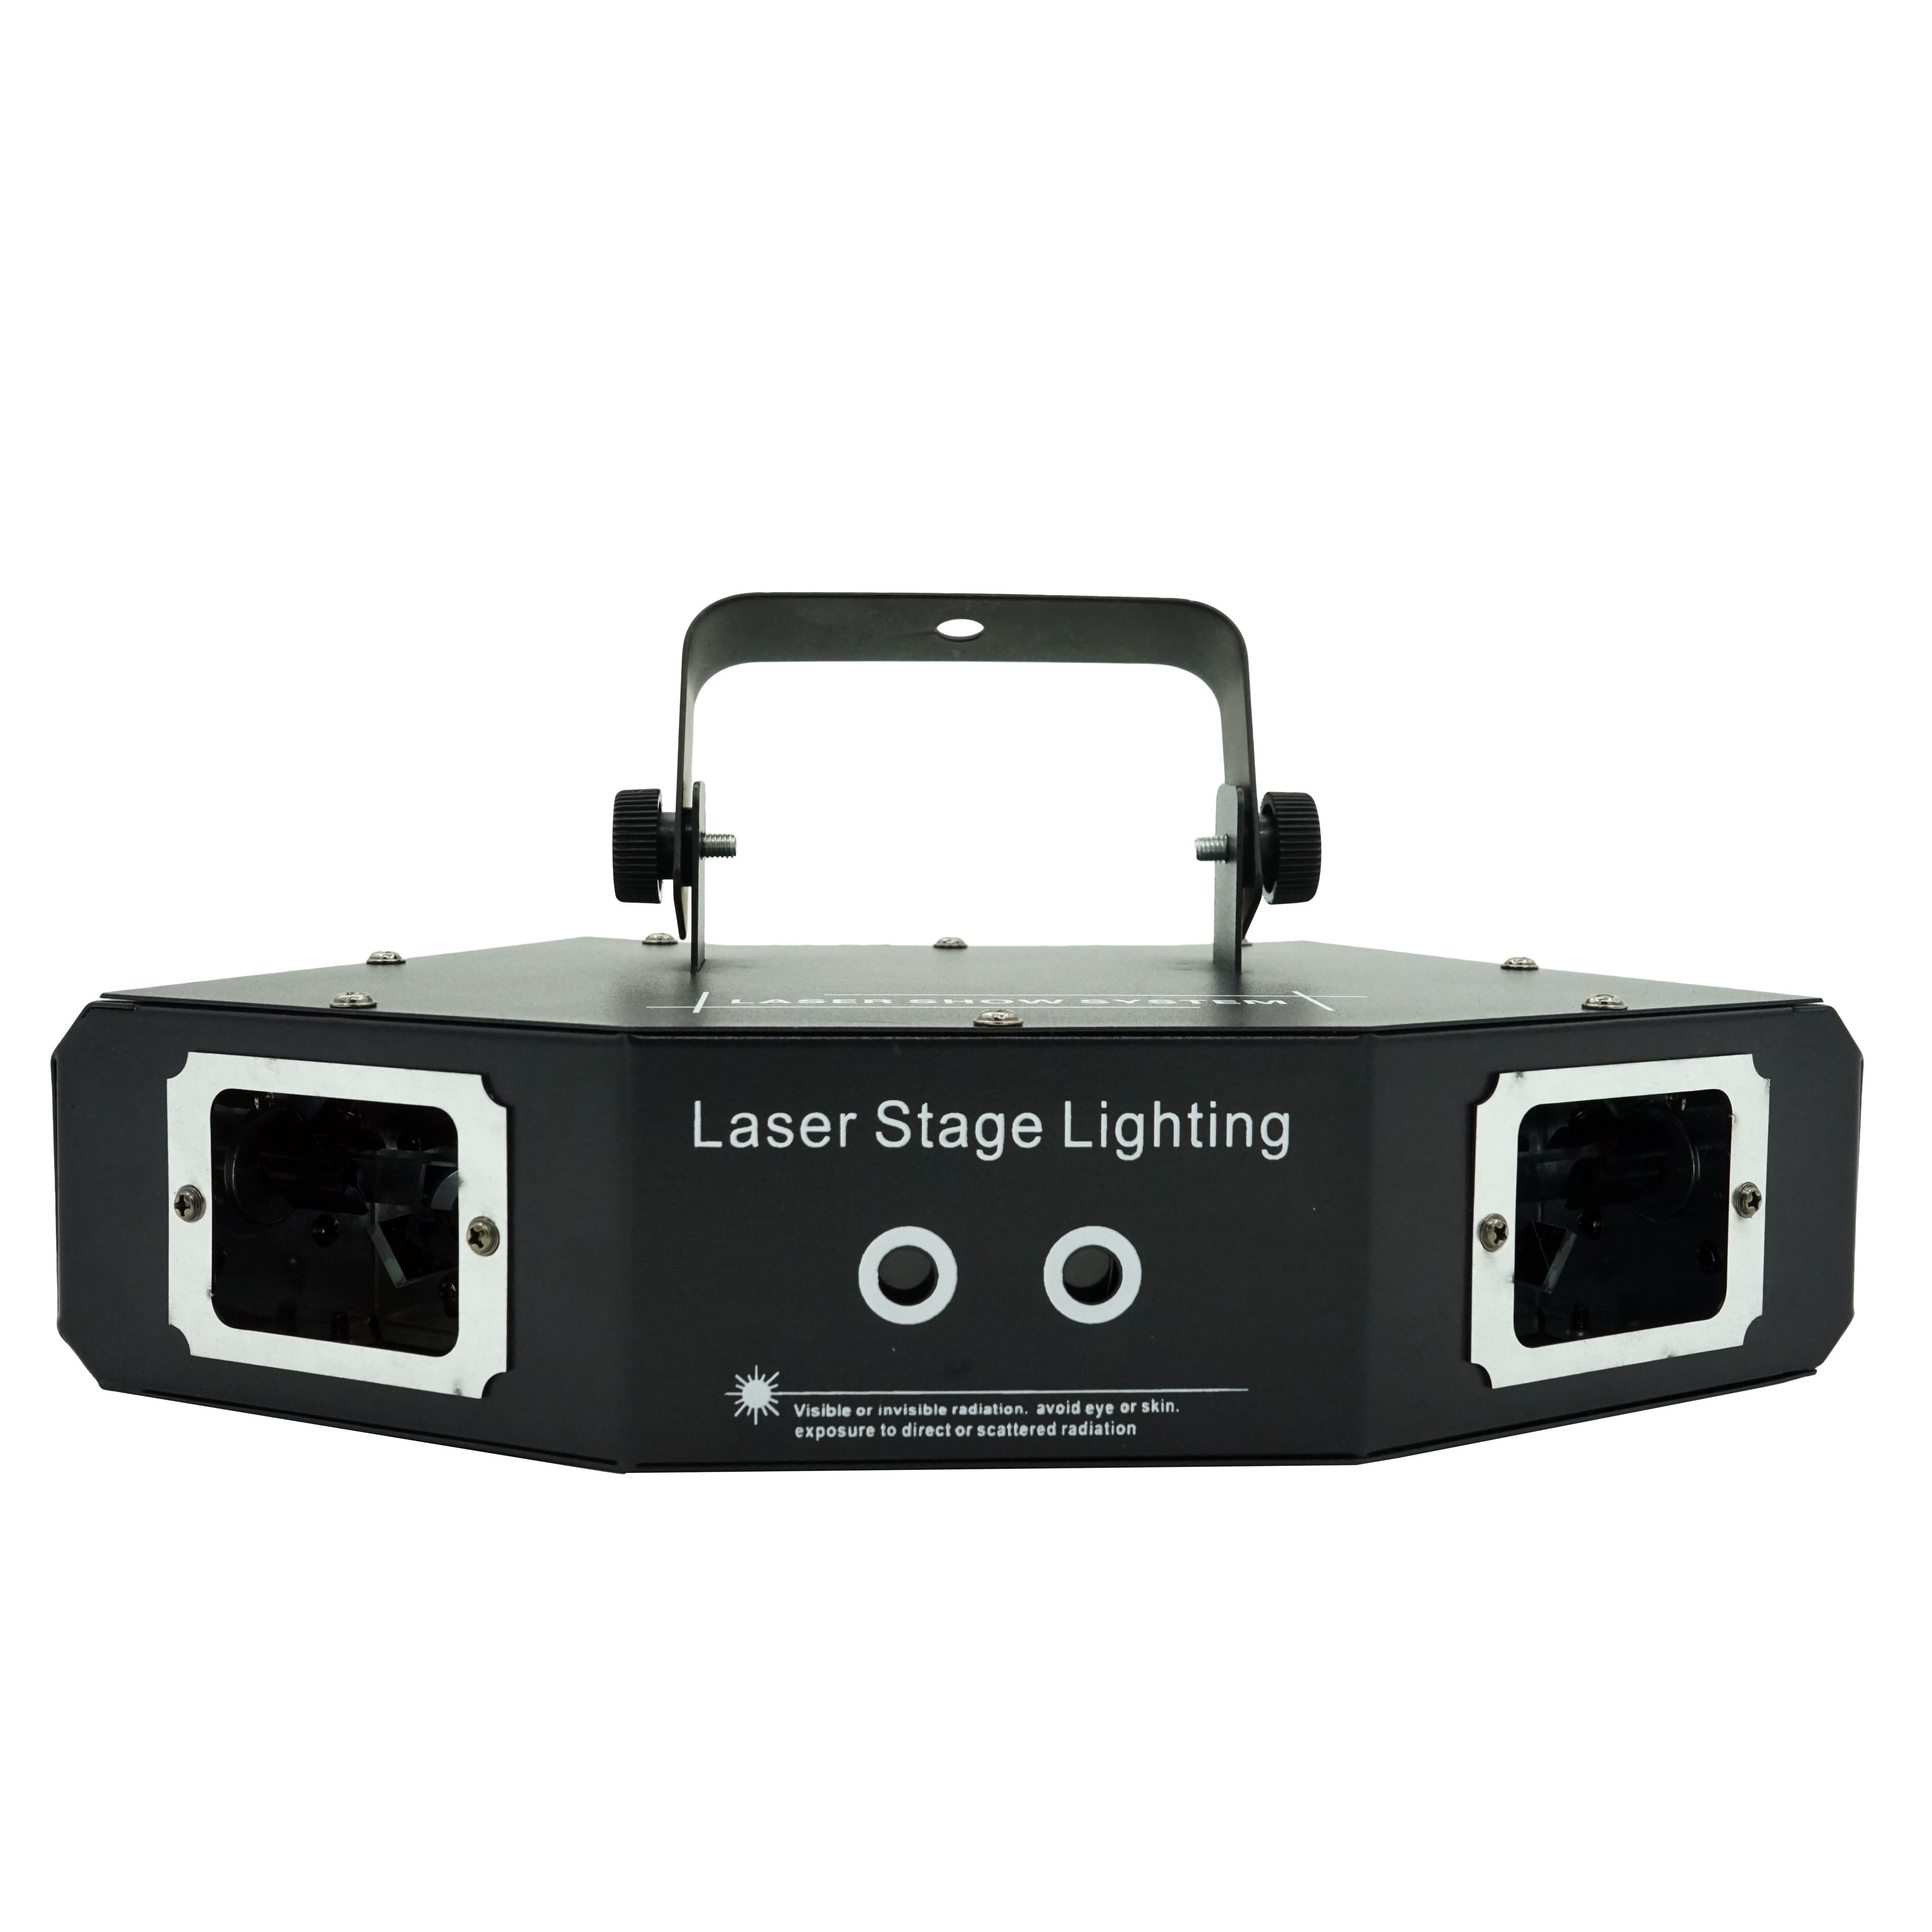 Hot Selling Laser Disco Lamp RGB Beam Scanning DMX 512 Professional Activities DJ Club High Brightness Stage Lighting